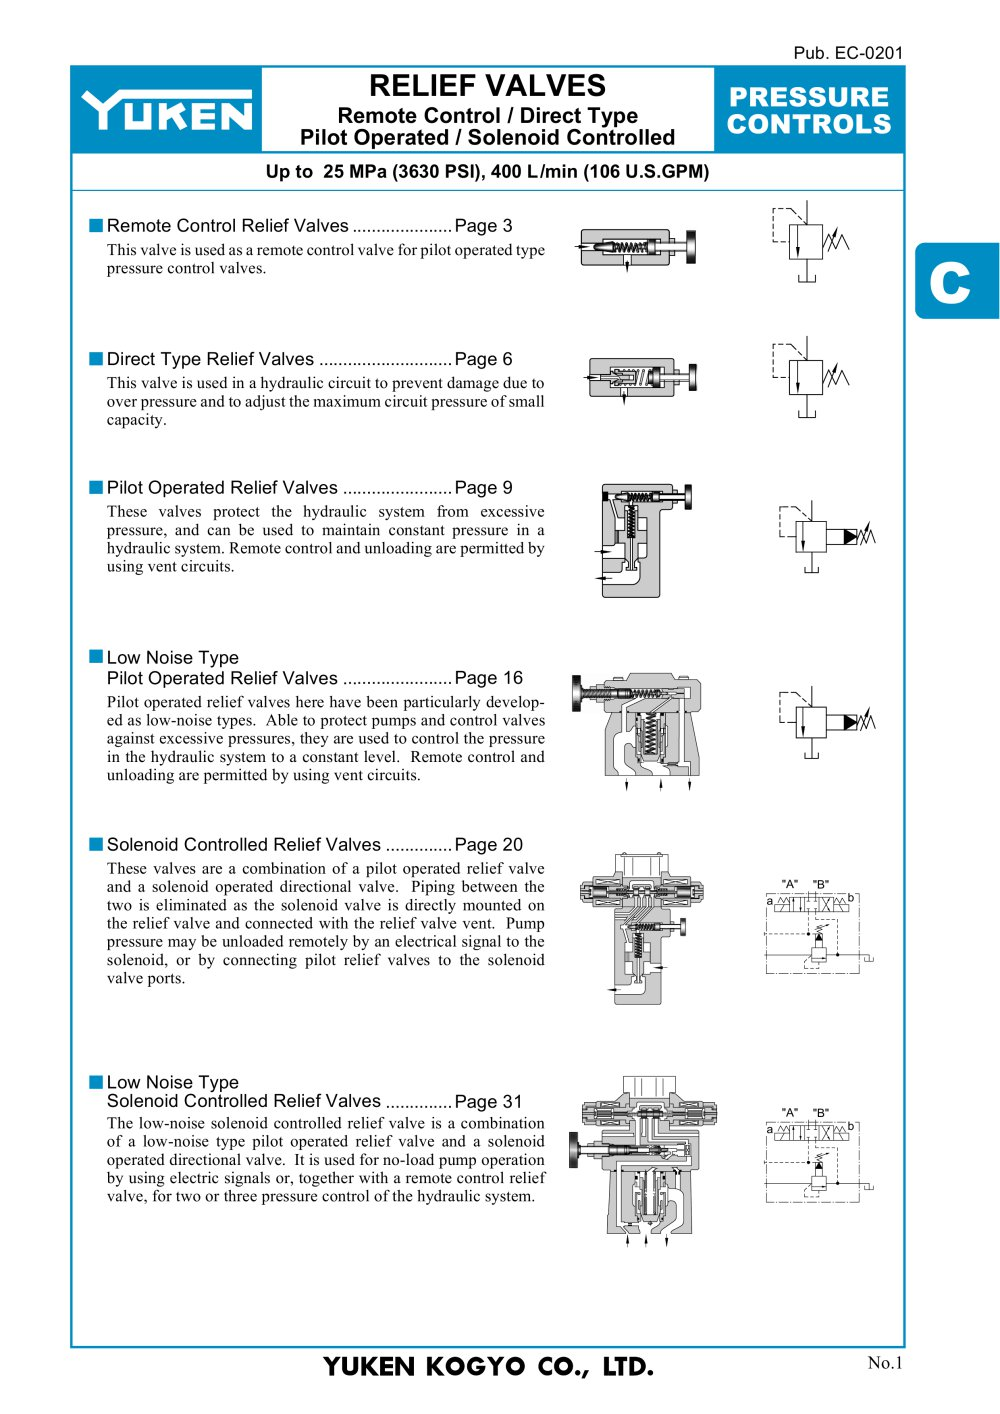 Hydraulic Schematic Symbols Relief Valve Trusted Wiring Diagram